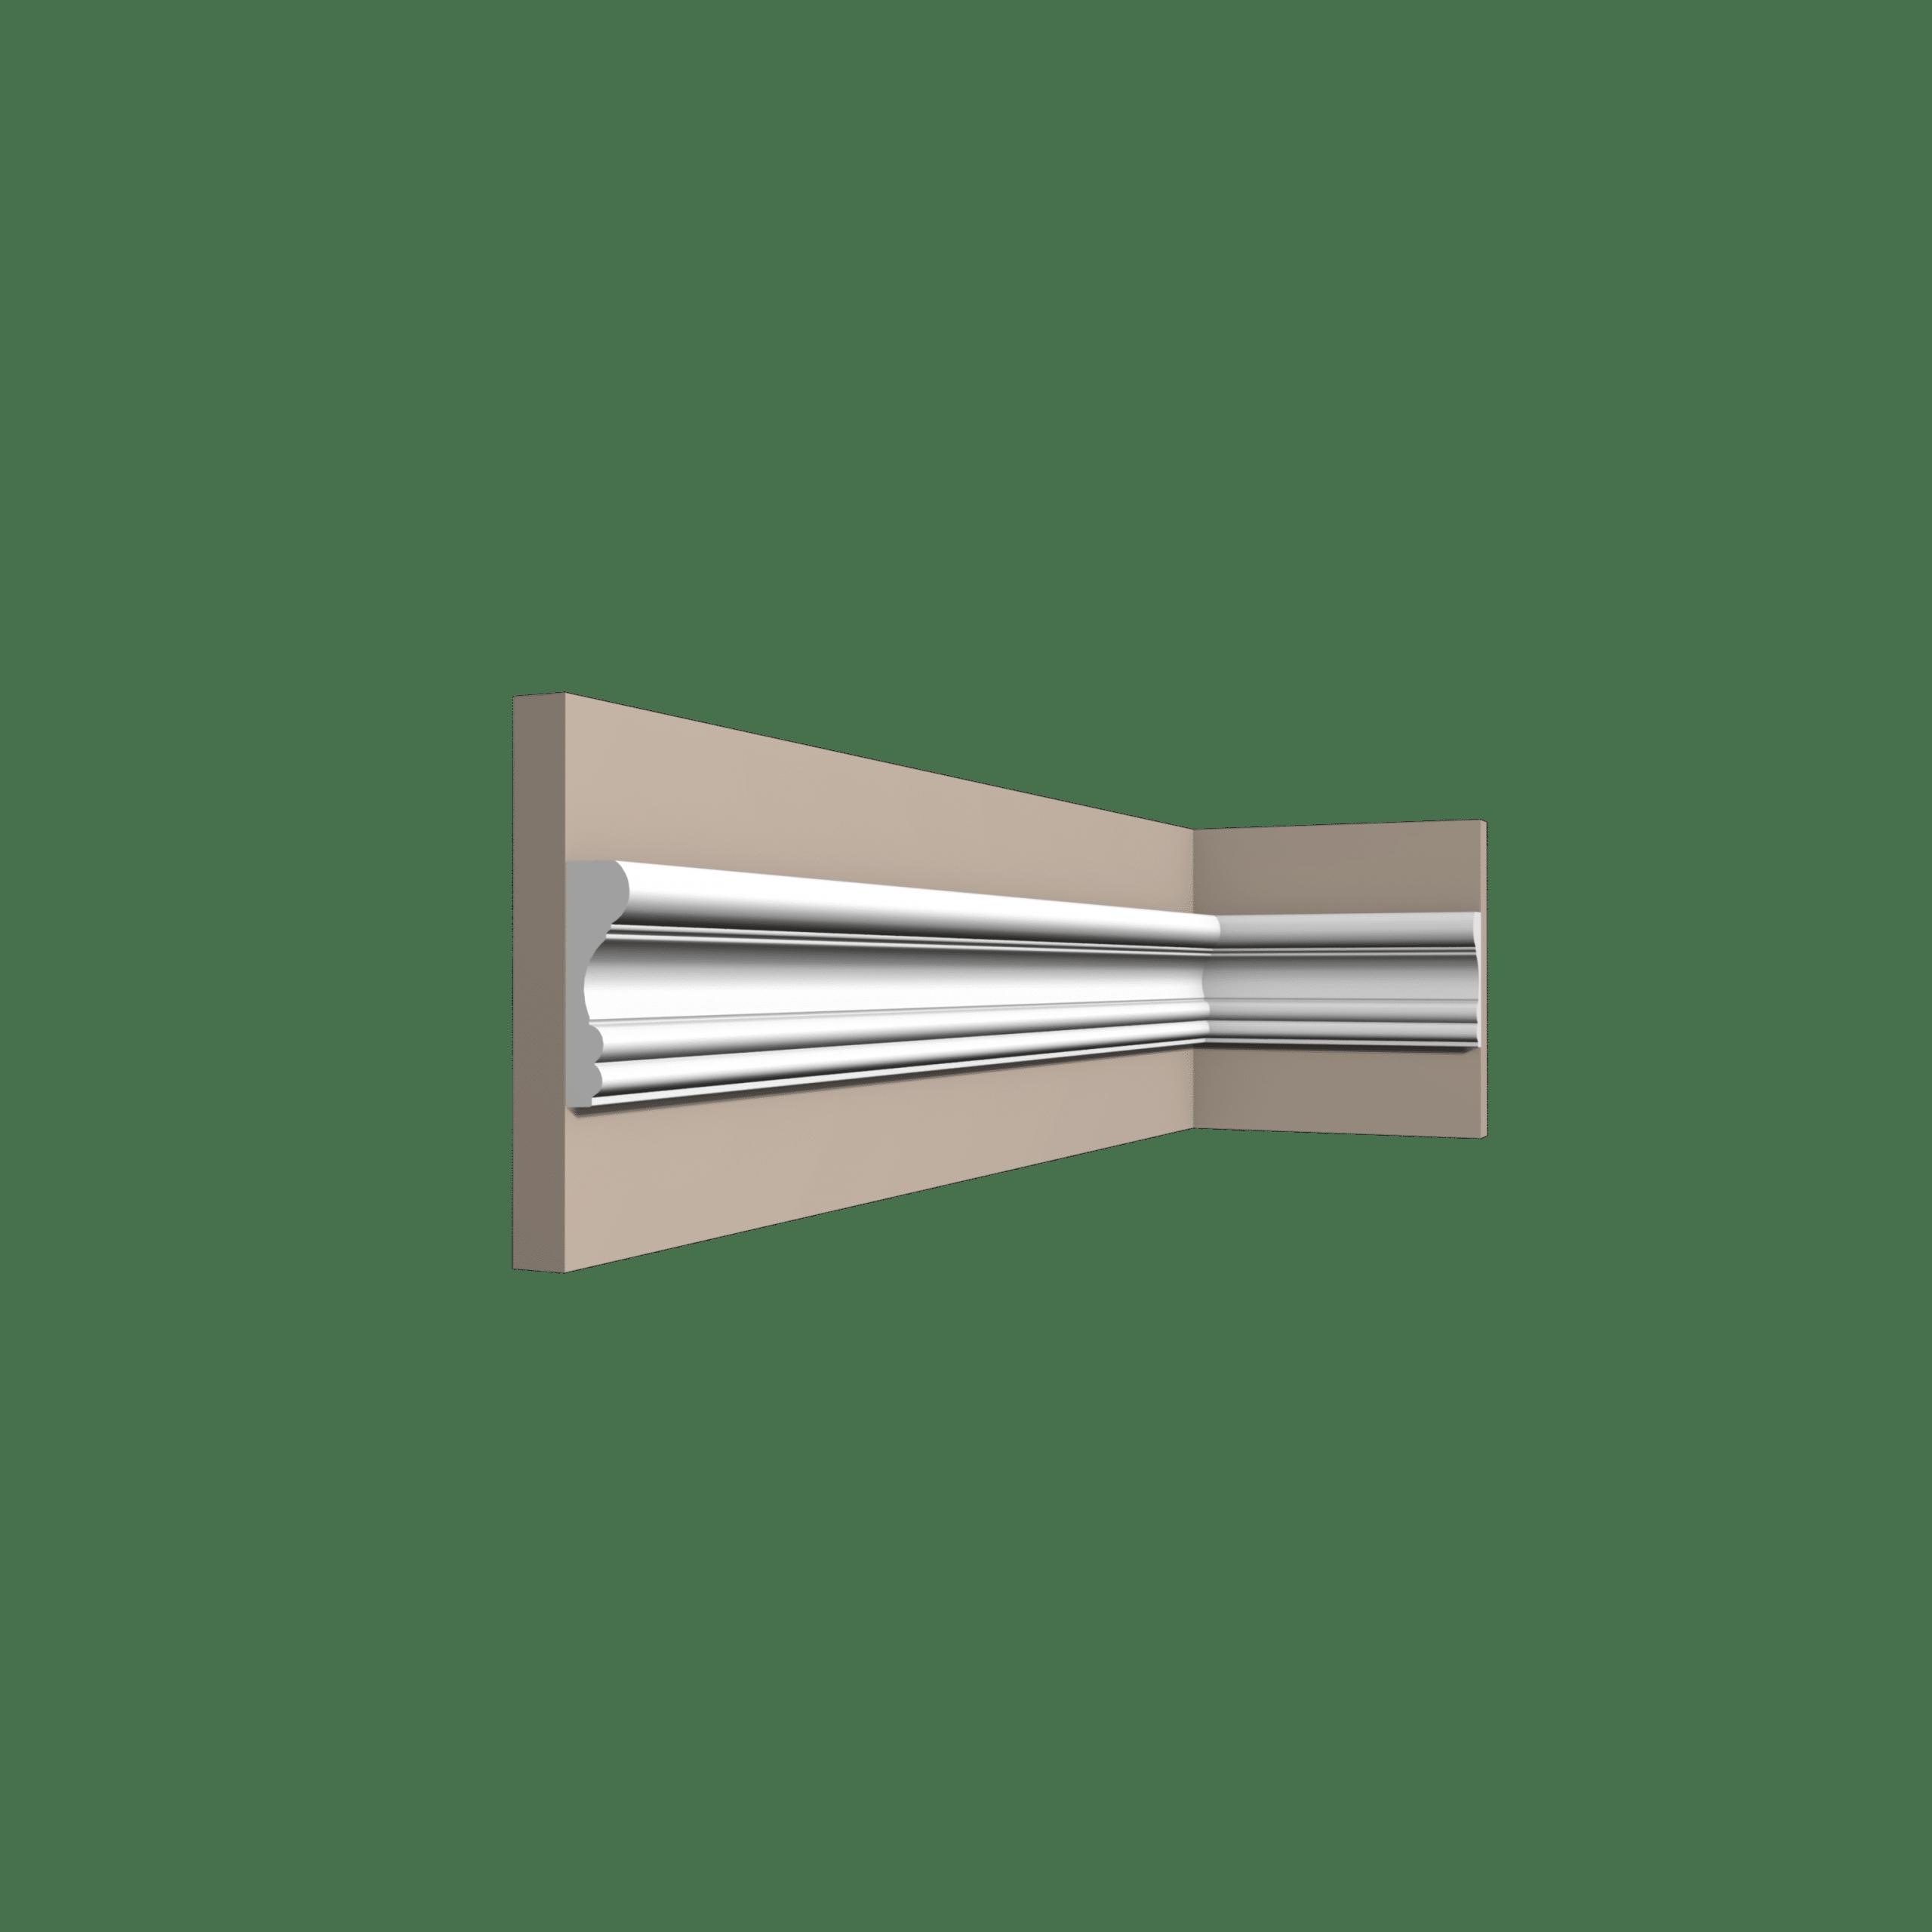 קרניז פוליאוריתן דגם DS - 2539